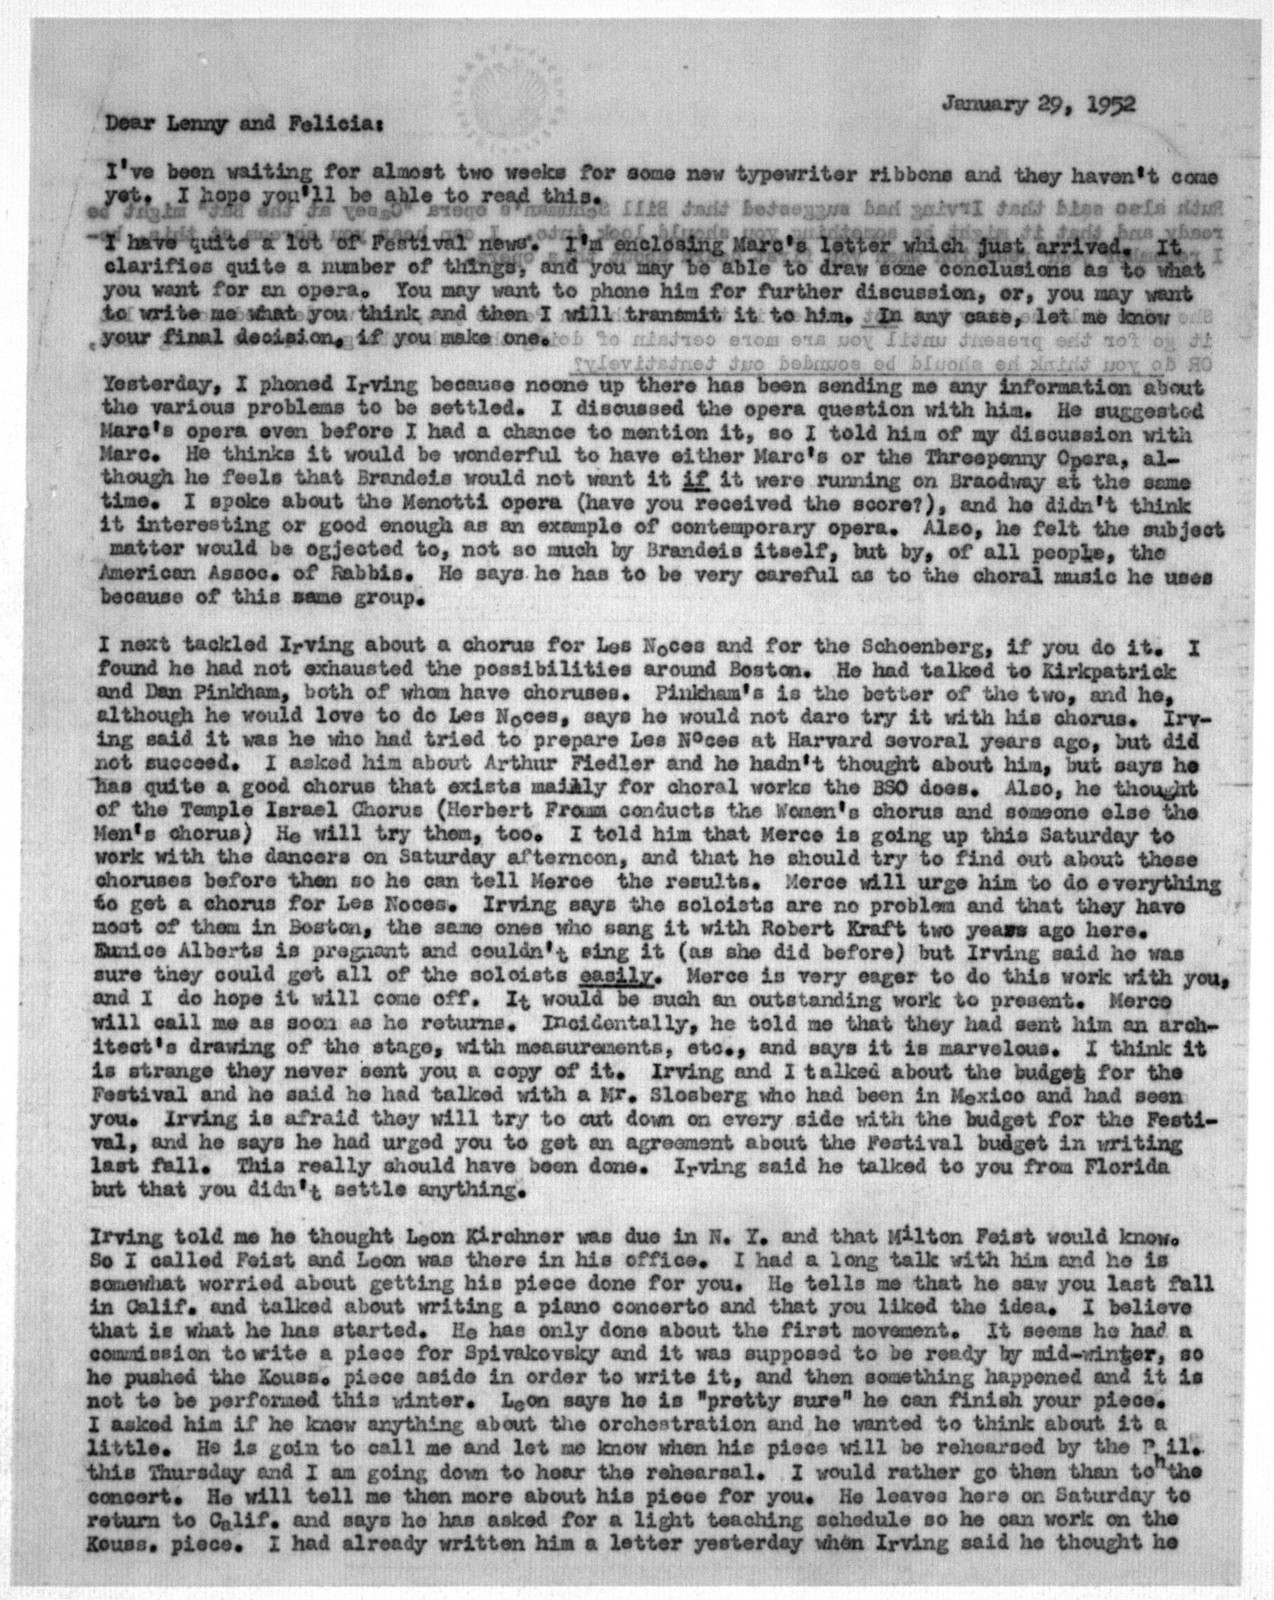 Letter from Helen Coates to Leonard & Felicia Bernstein, n.d.